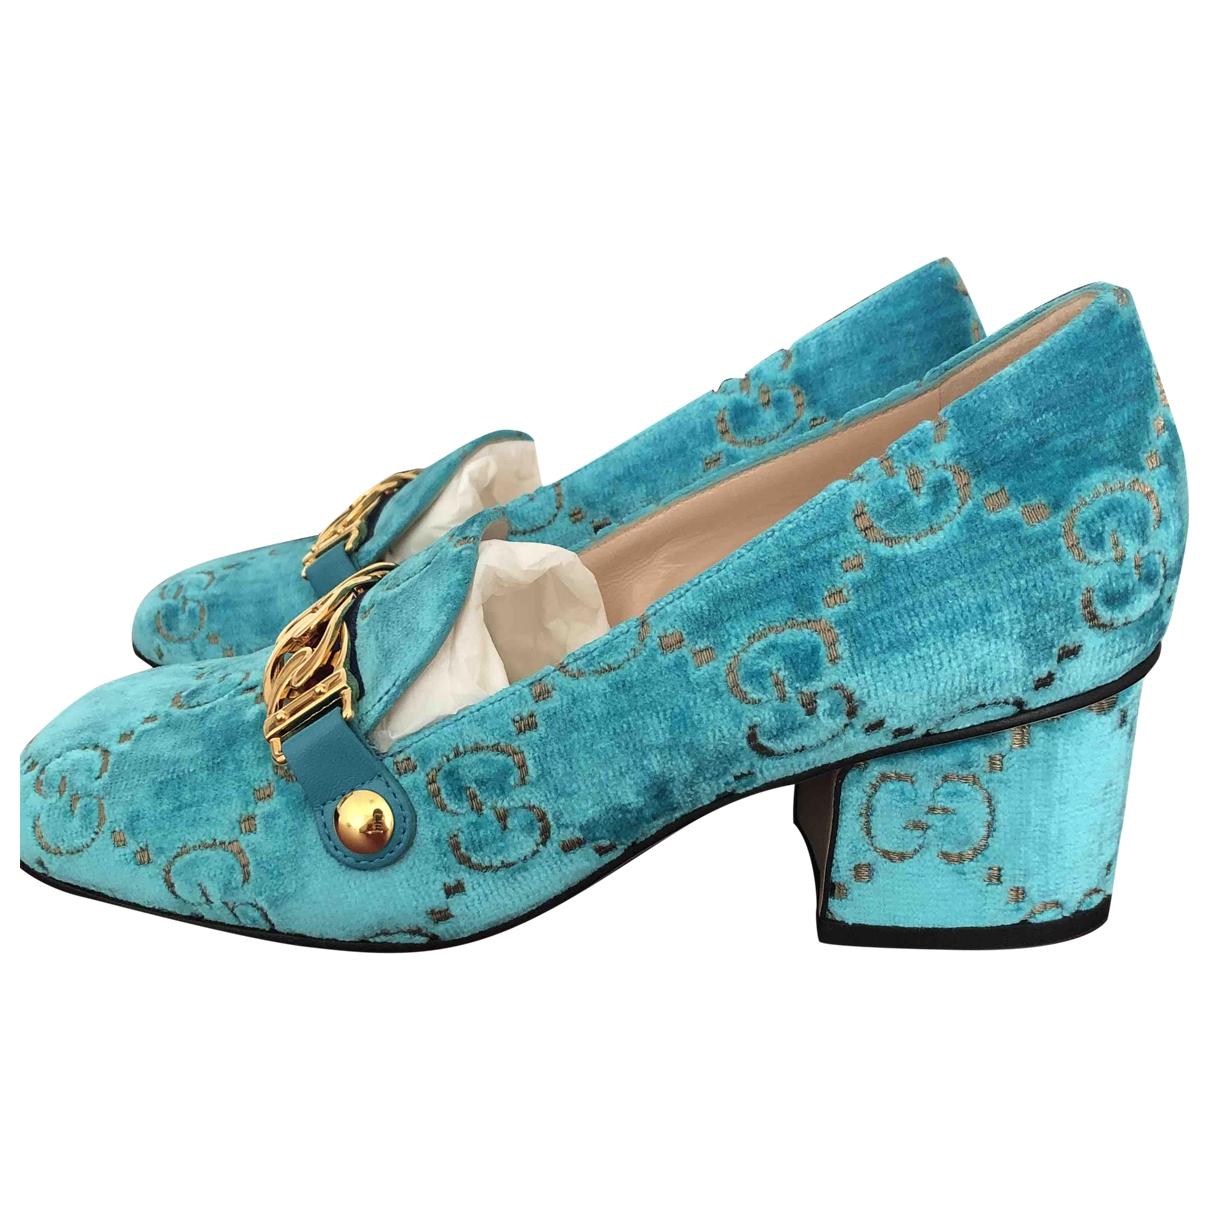 Gucci \N Blue Velvet Flats for Women 36 EU